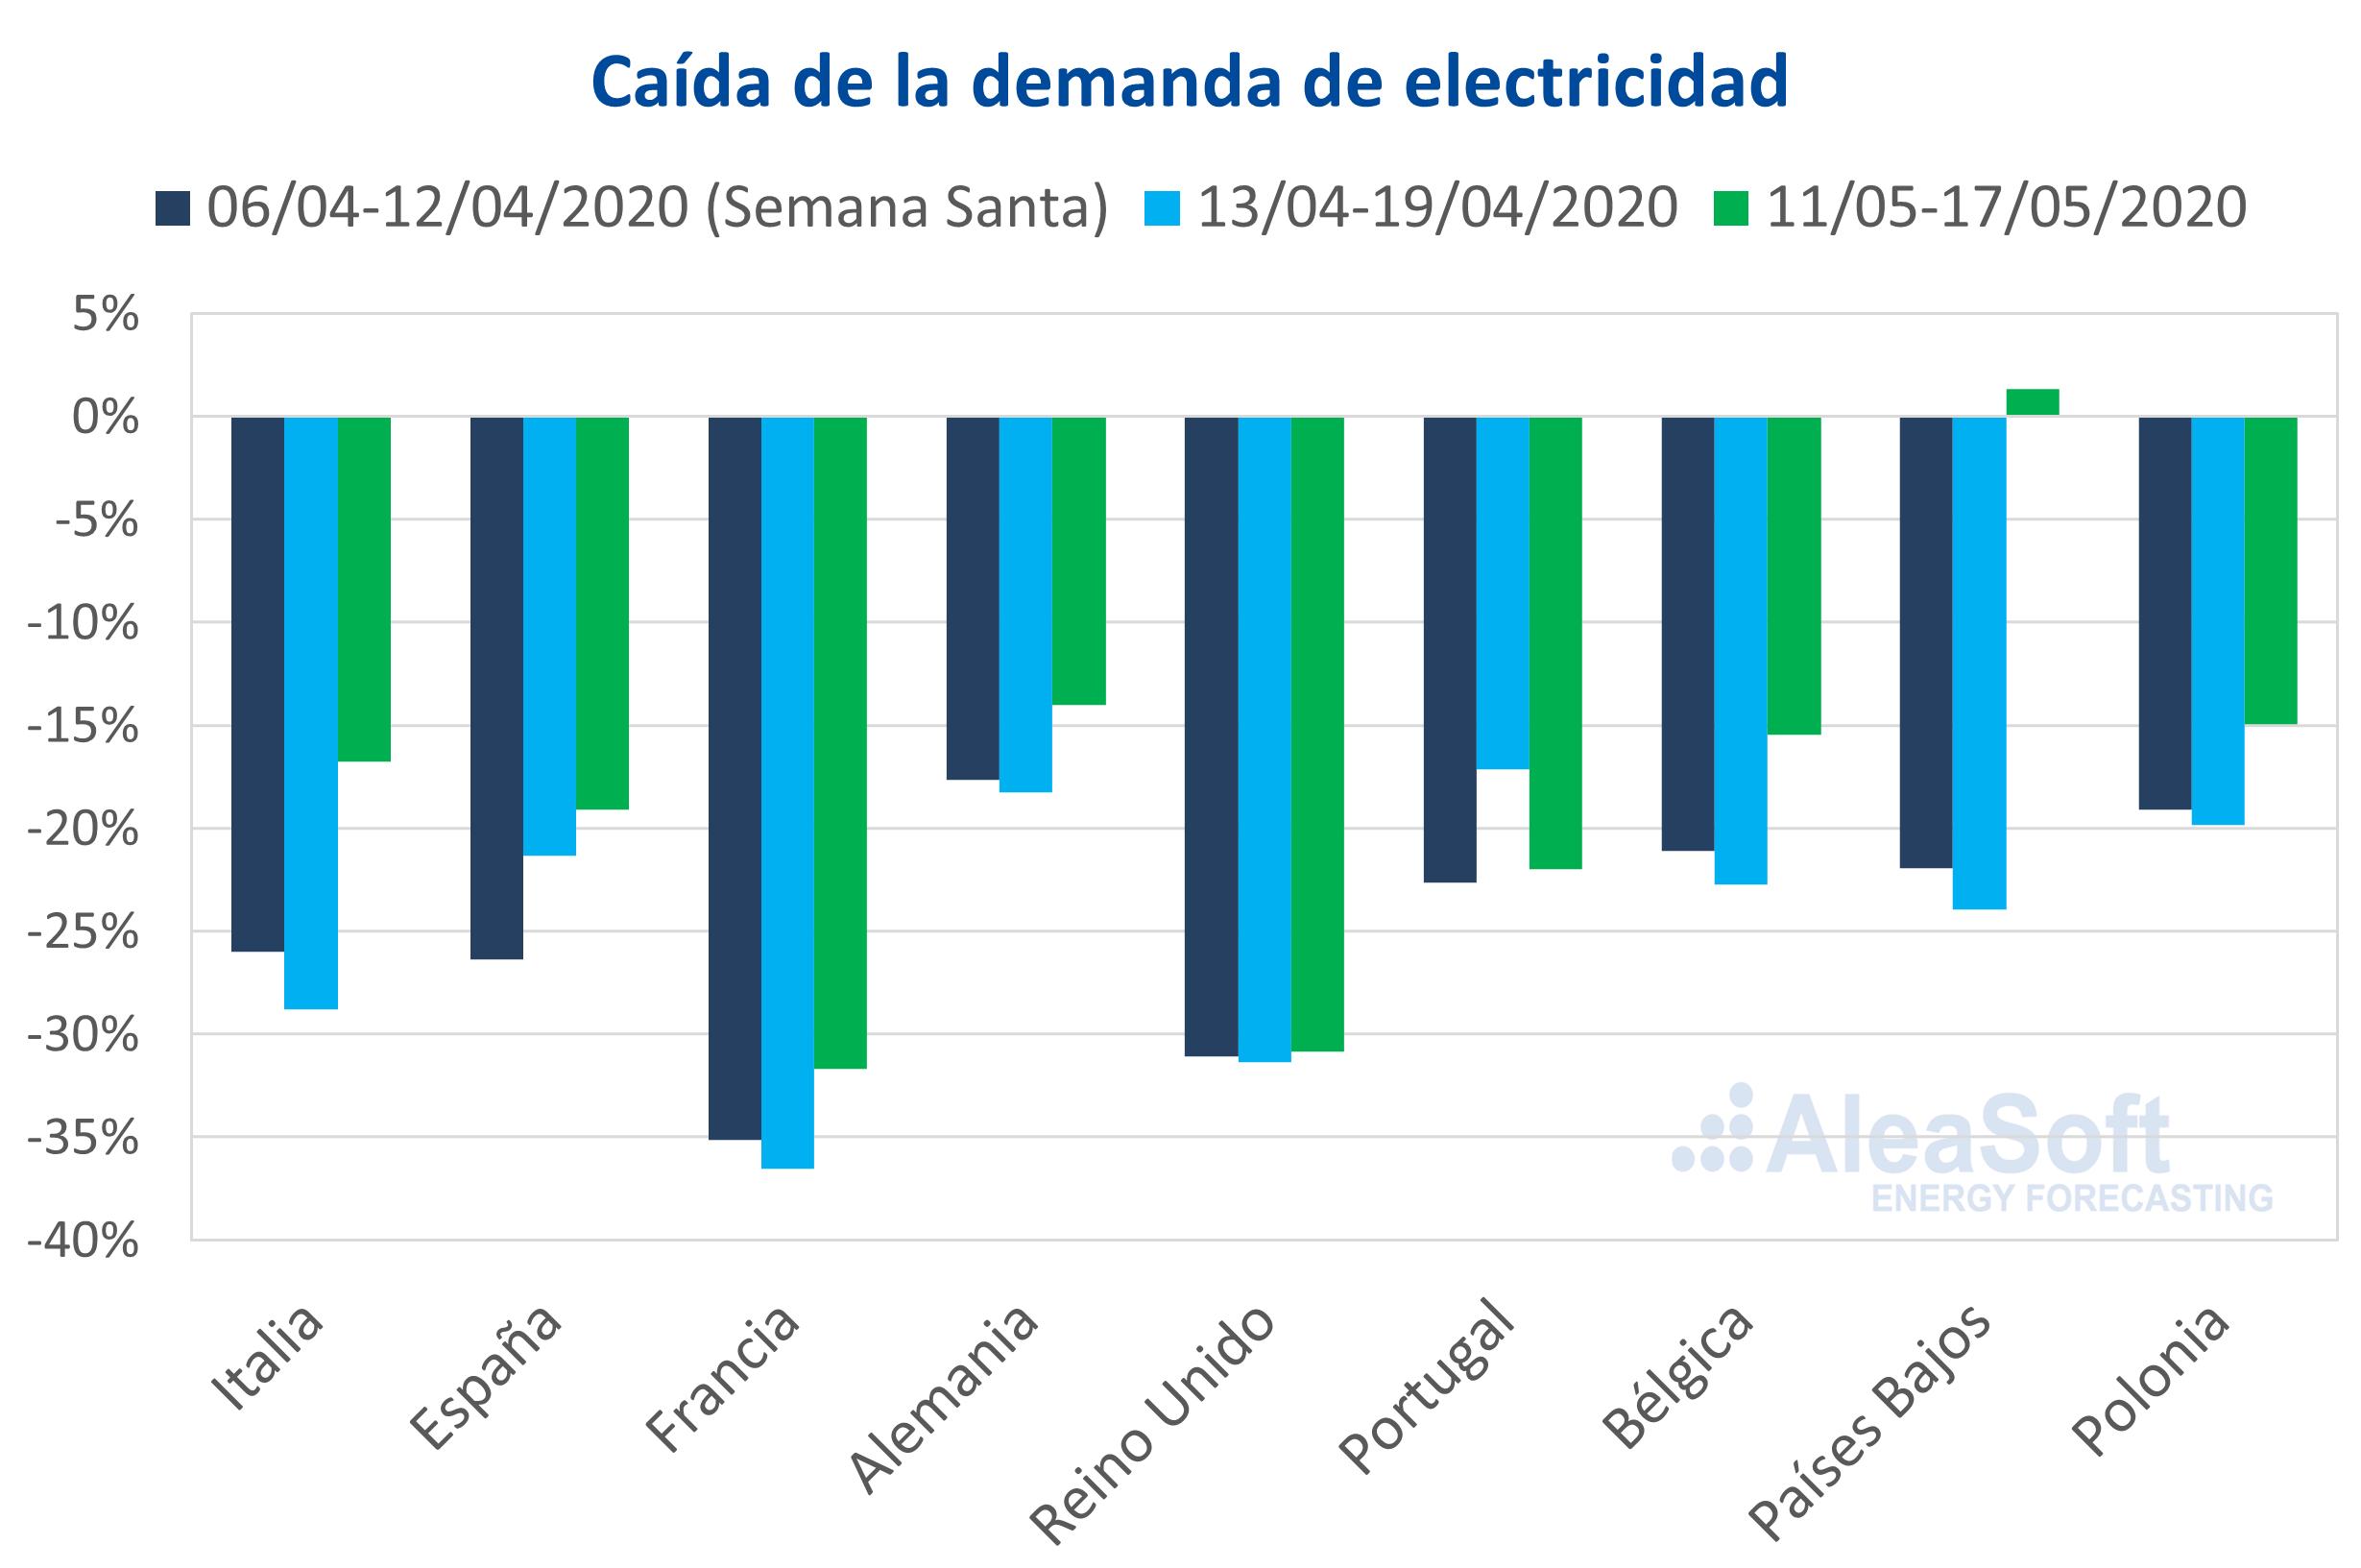 AleaSoft - Caida demanda electricidad Europa coronavirus